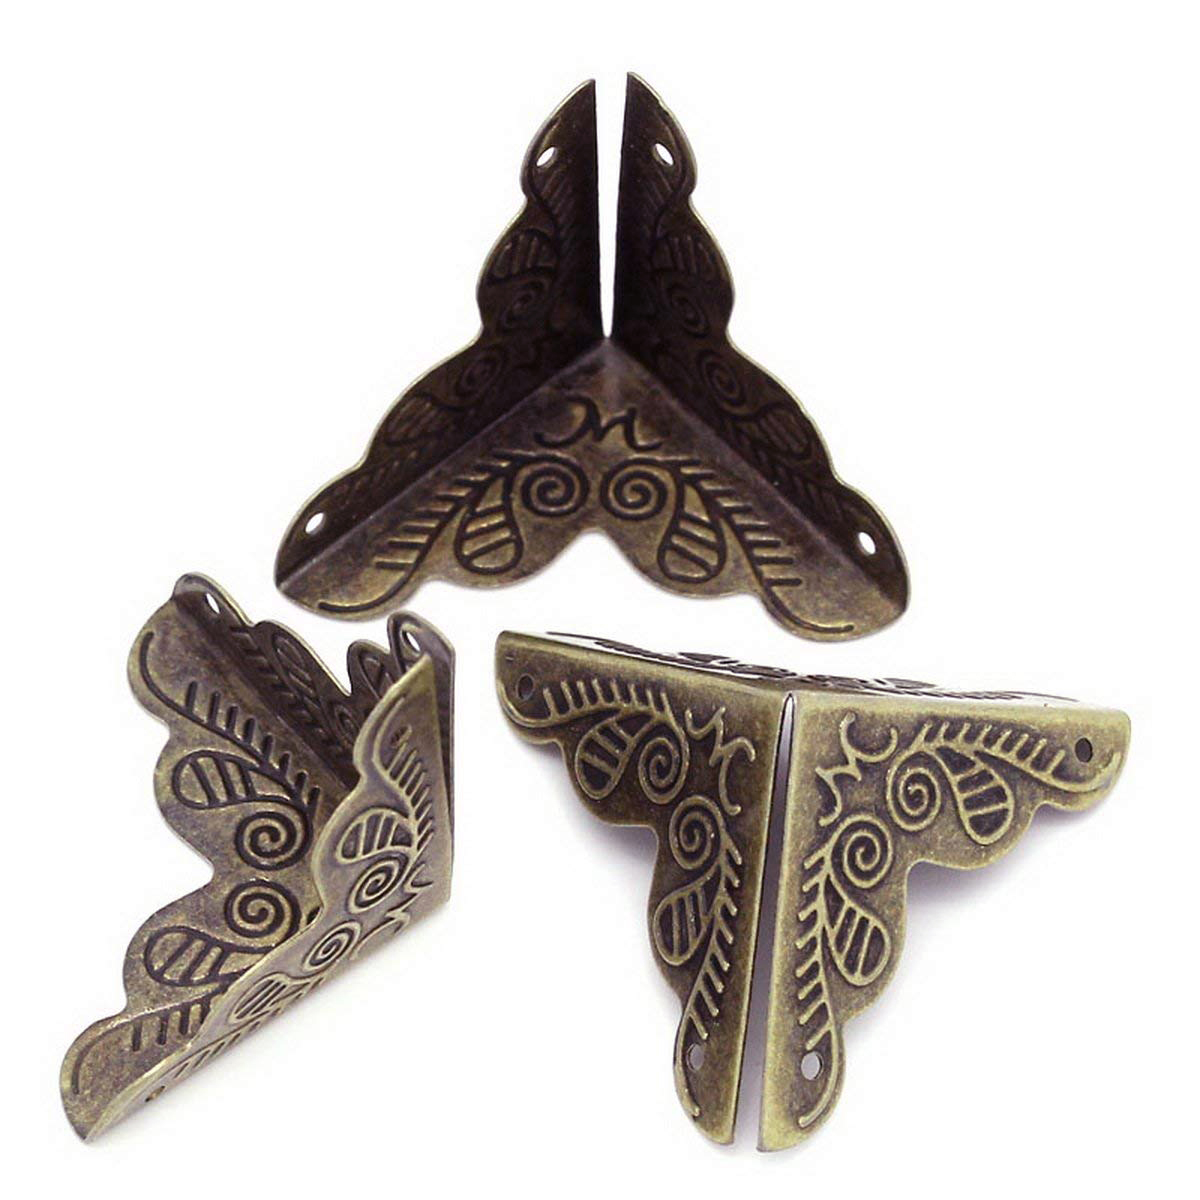 30pcs Vintage Luggage Case Box Corners For Furniture Decor Triangle Rattan Carved 3.6x1.9cm-bronze Tone Brackets Decorative